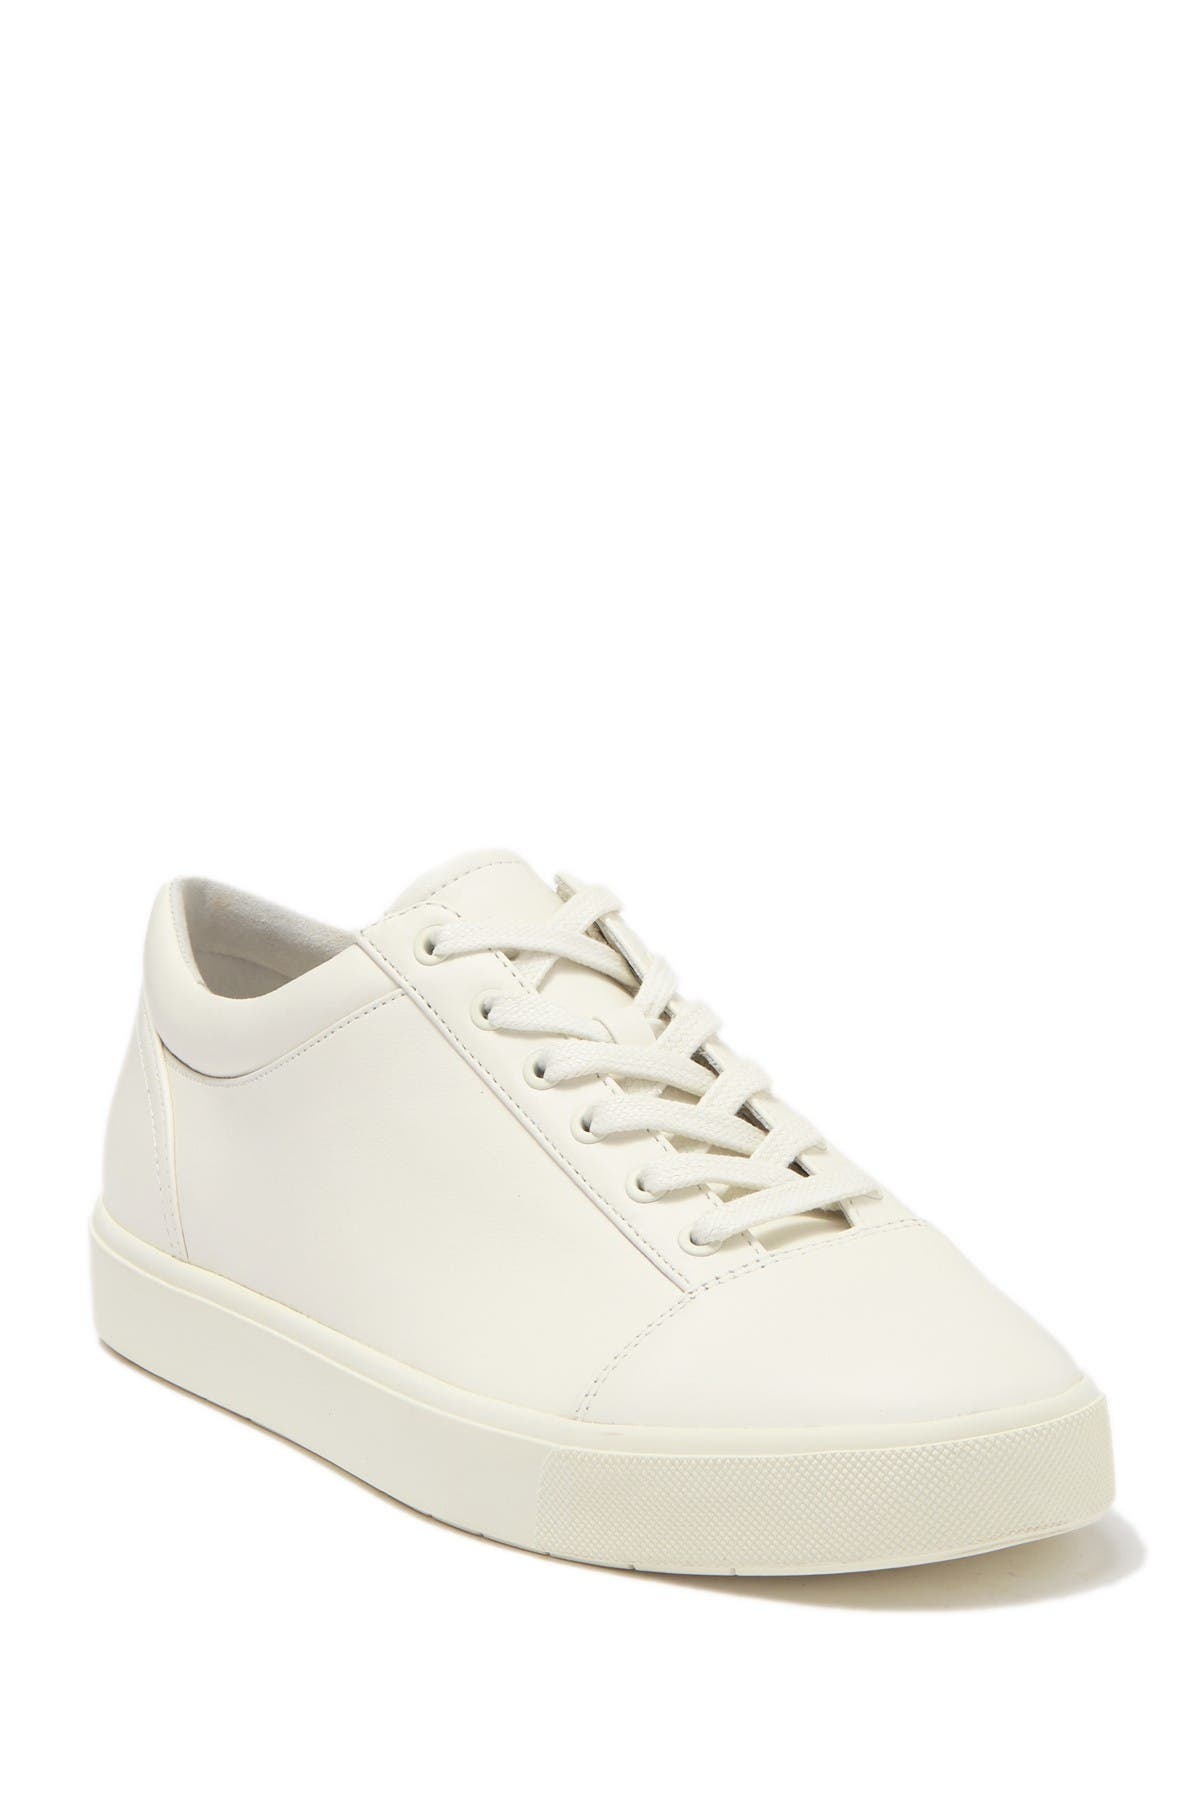 Vince   Belford Leather Sneaker